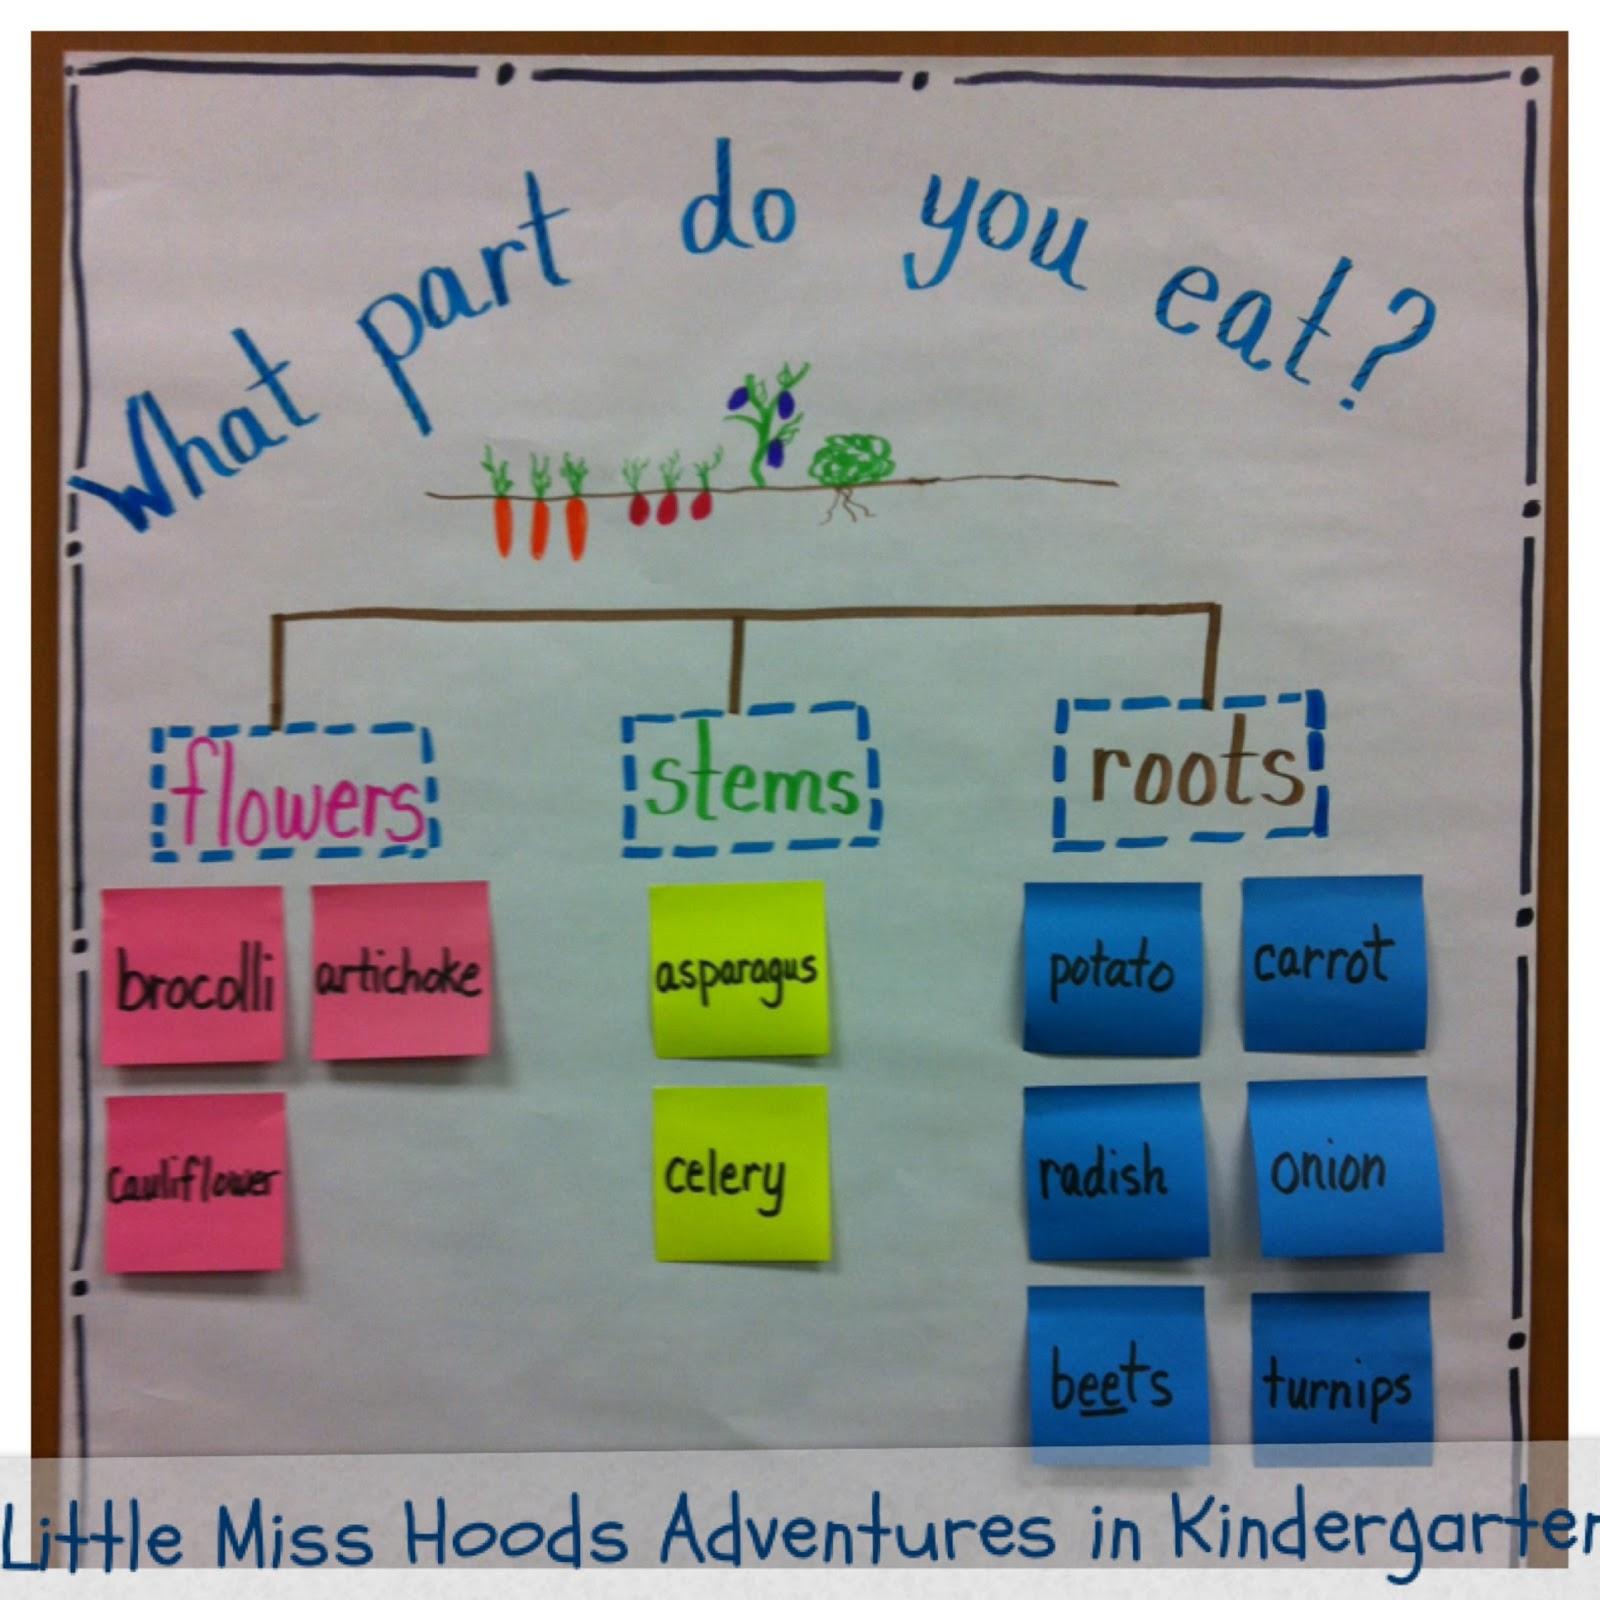 little miss hood 39 s adventures in kindergarten plants. Black Bedroom Furniture Sets. Home Design Ideas